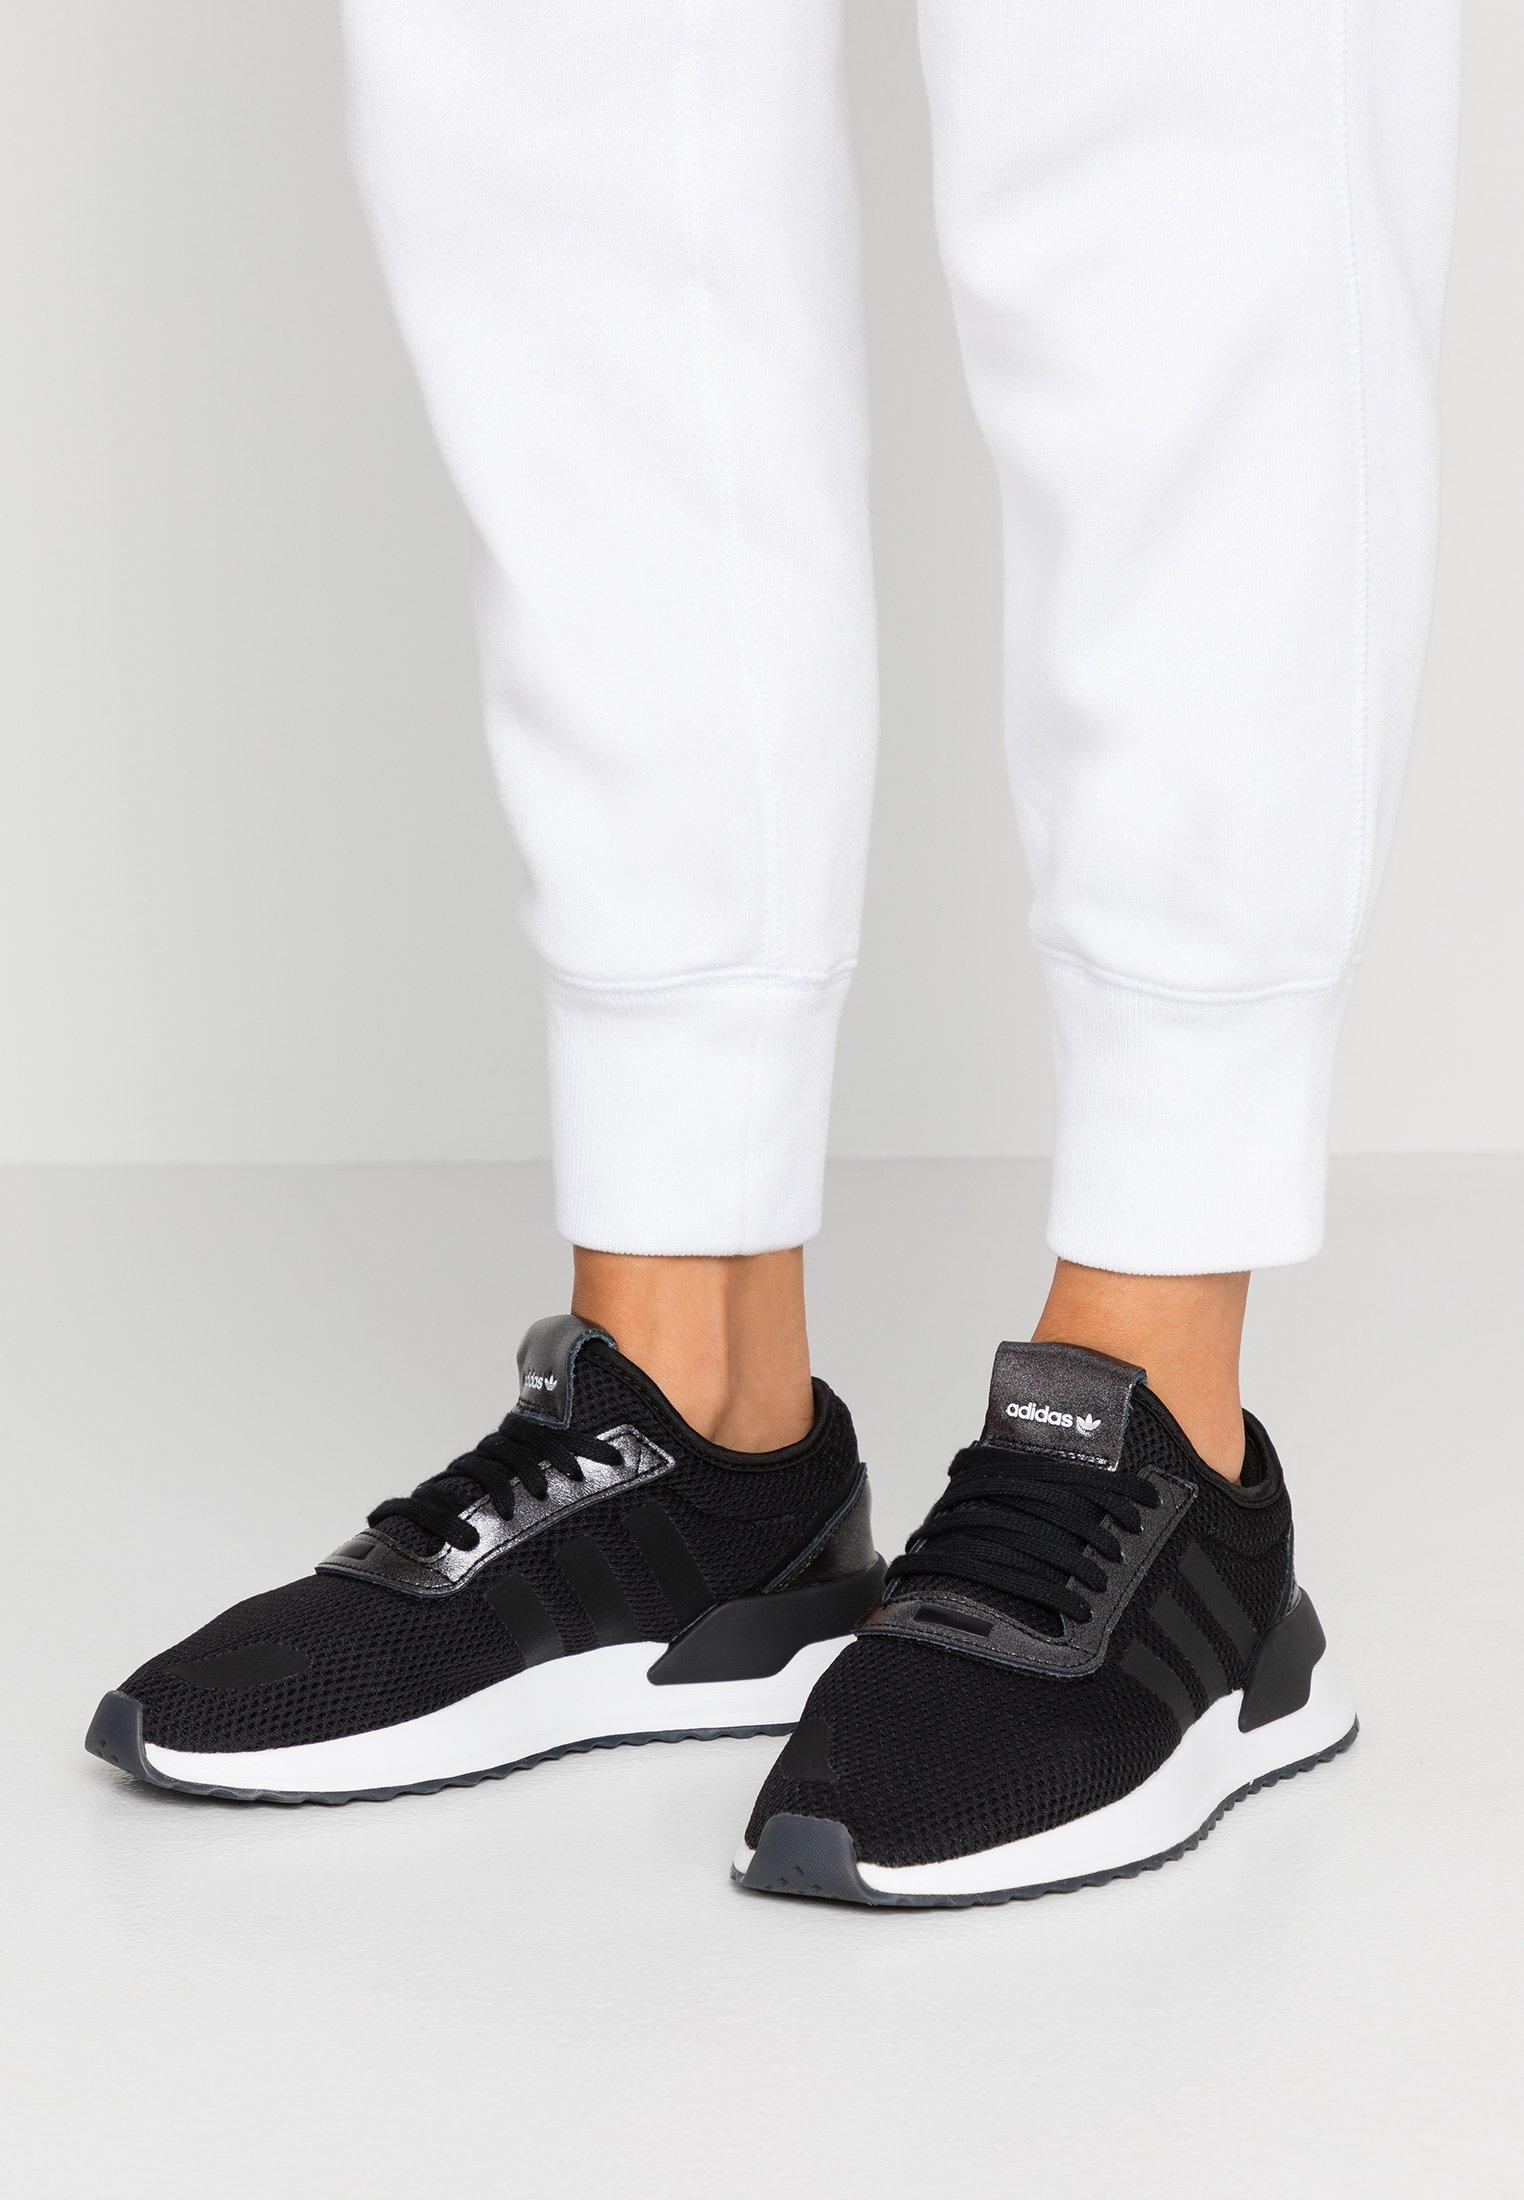 Derrotado coro Marte  adidas Originals U_PATH X RUNNING-STYLE SHOES - Trainers - core  black/purple beauty/footwear white/black - Zalando.ie